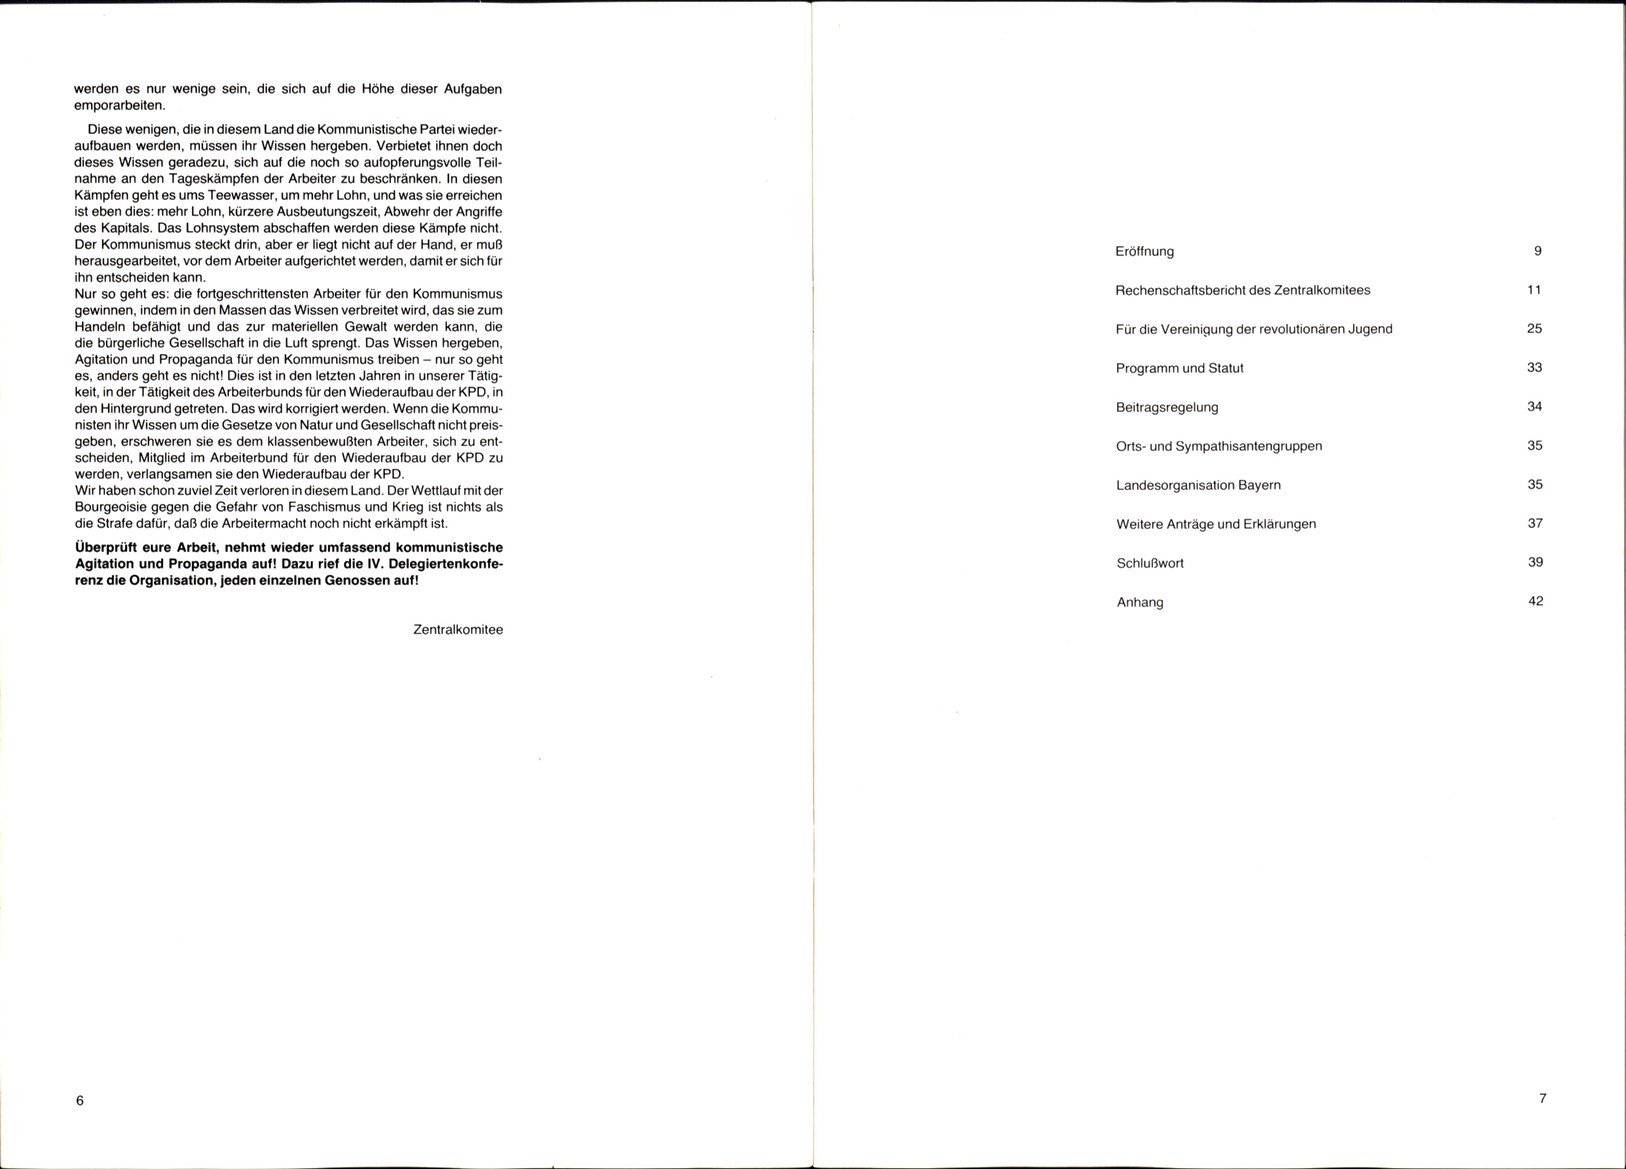 ABG_1985_Beschluesse_IV_Delegiertenkonferenz_05